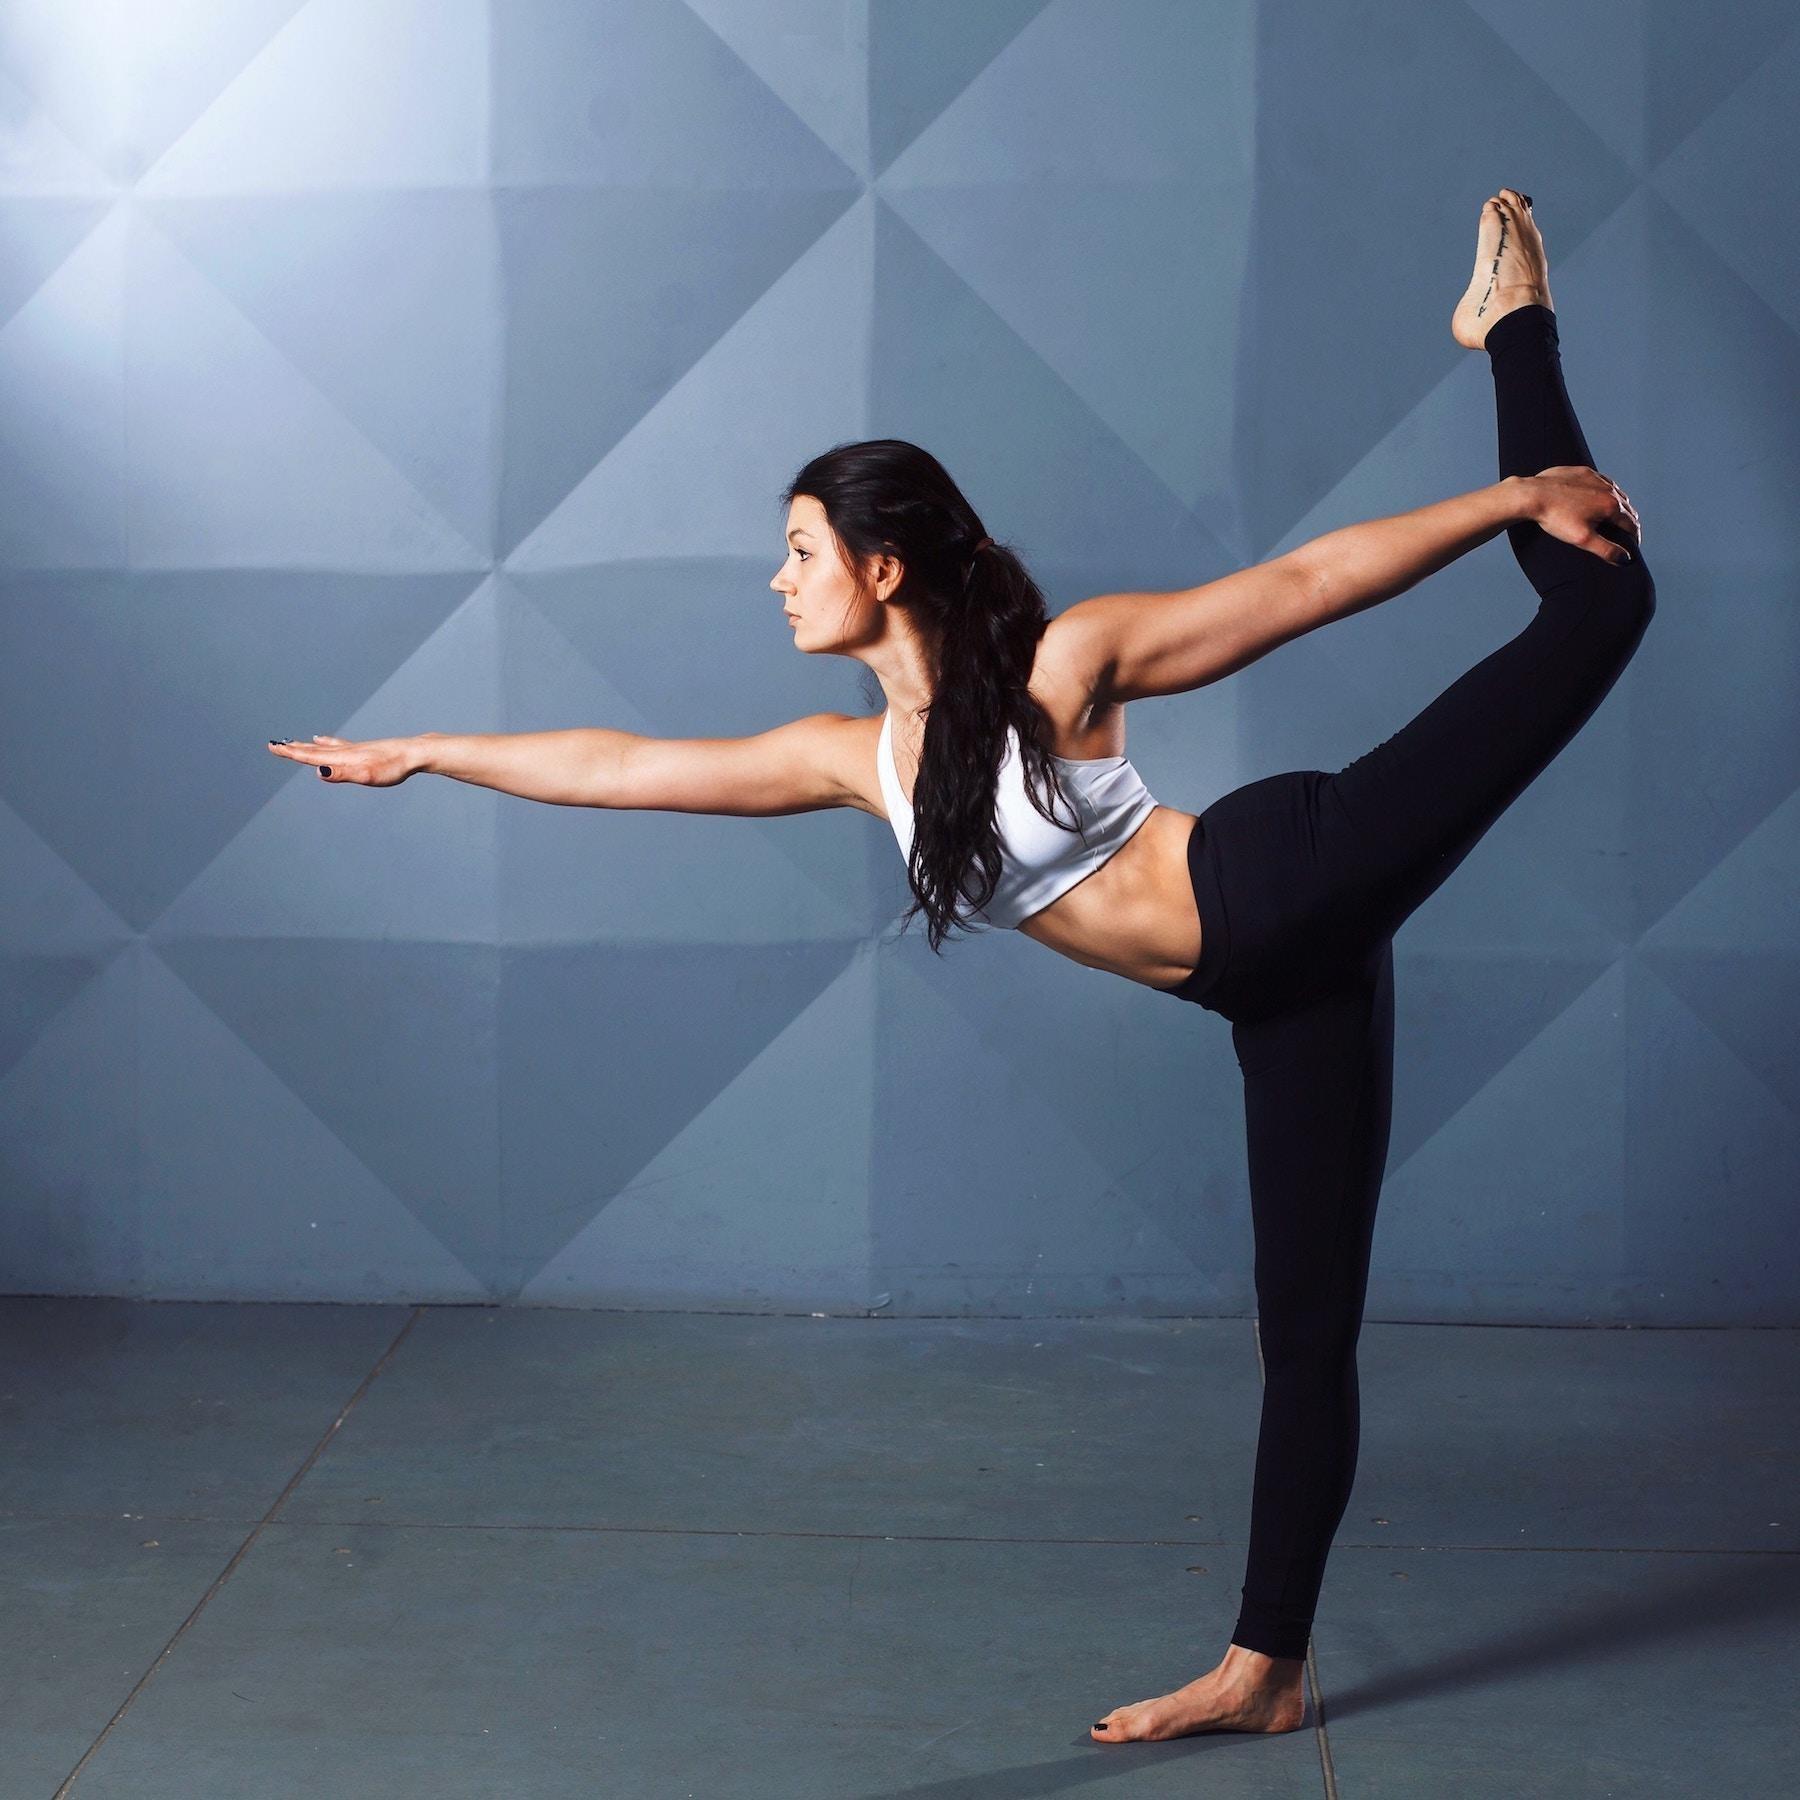 Eastern Suburbs Yoga Studio - Price Reduced